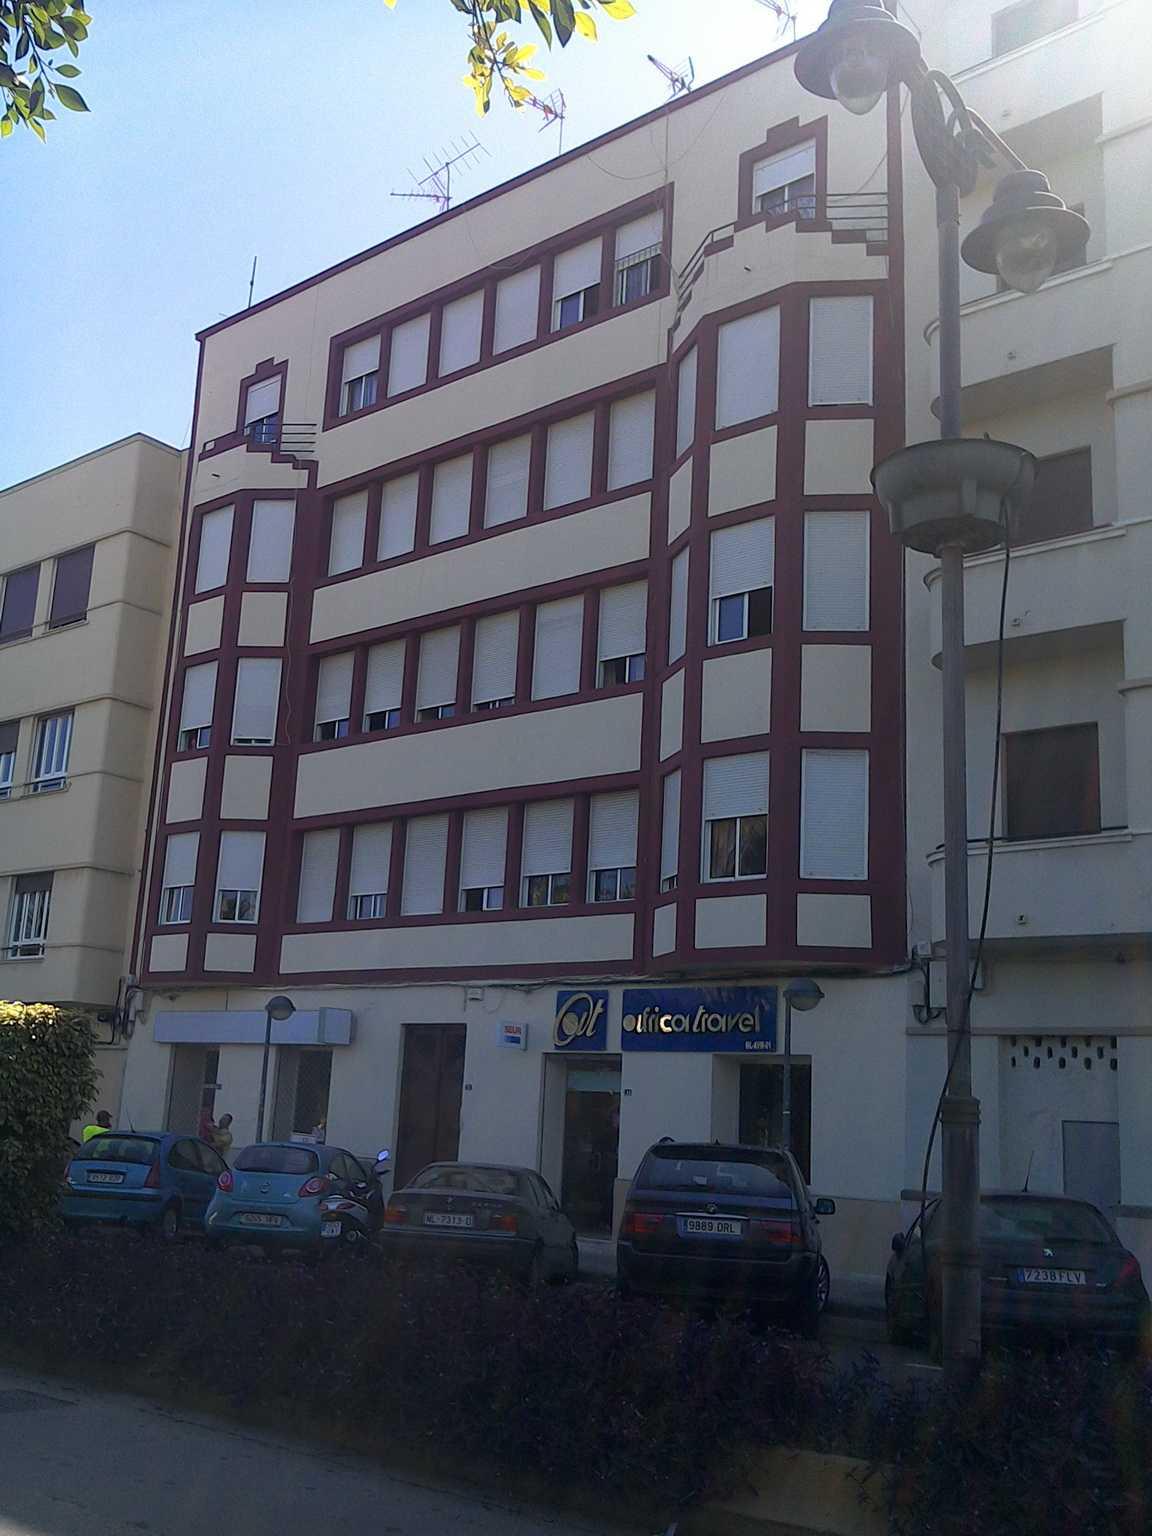 Casa de Abraham Benatar (avenida de la Democracia, 11)